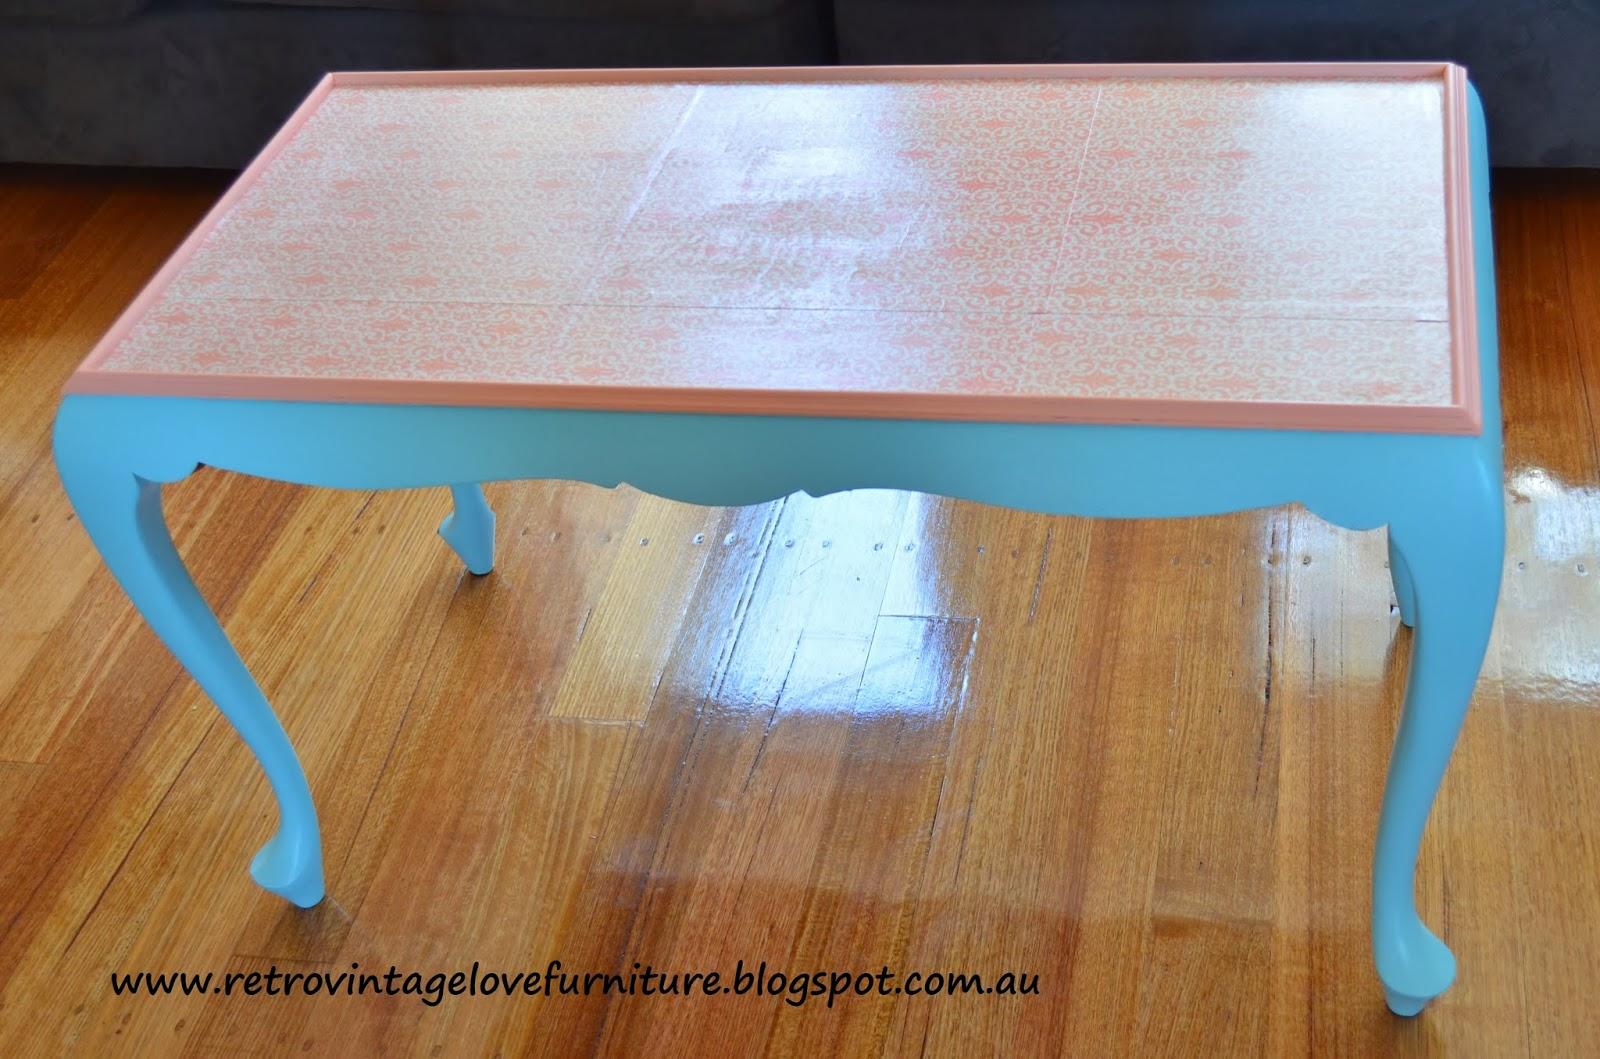 Retro Vintage Love Aqua And Coral Queen Anne Coffee Table